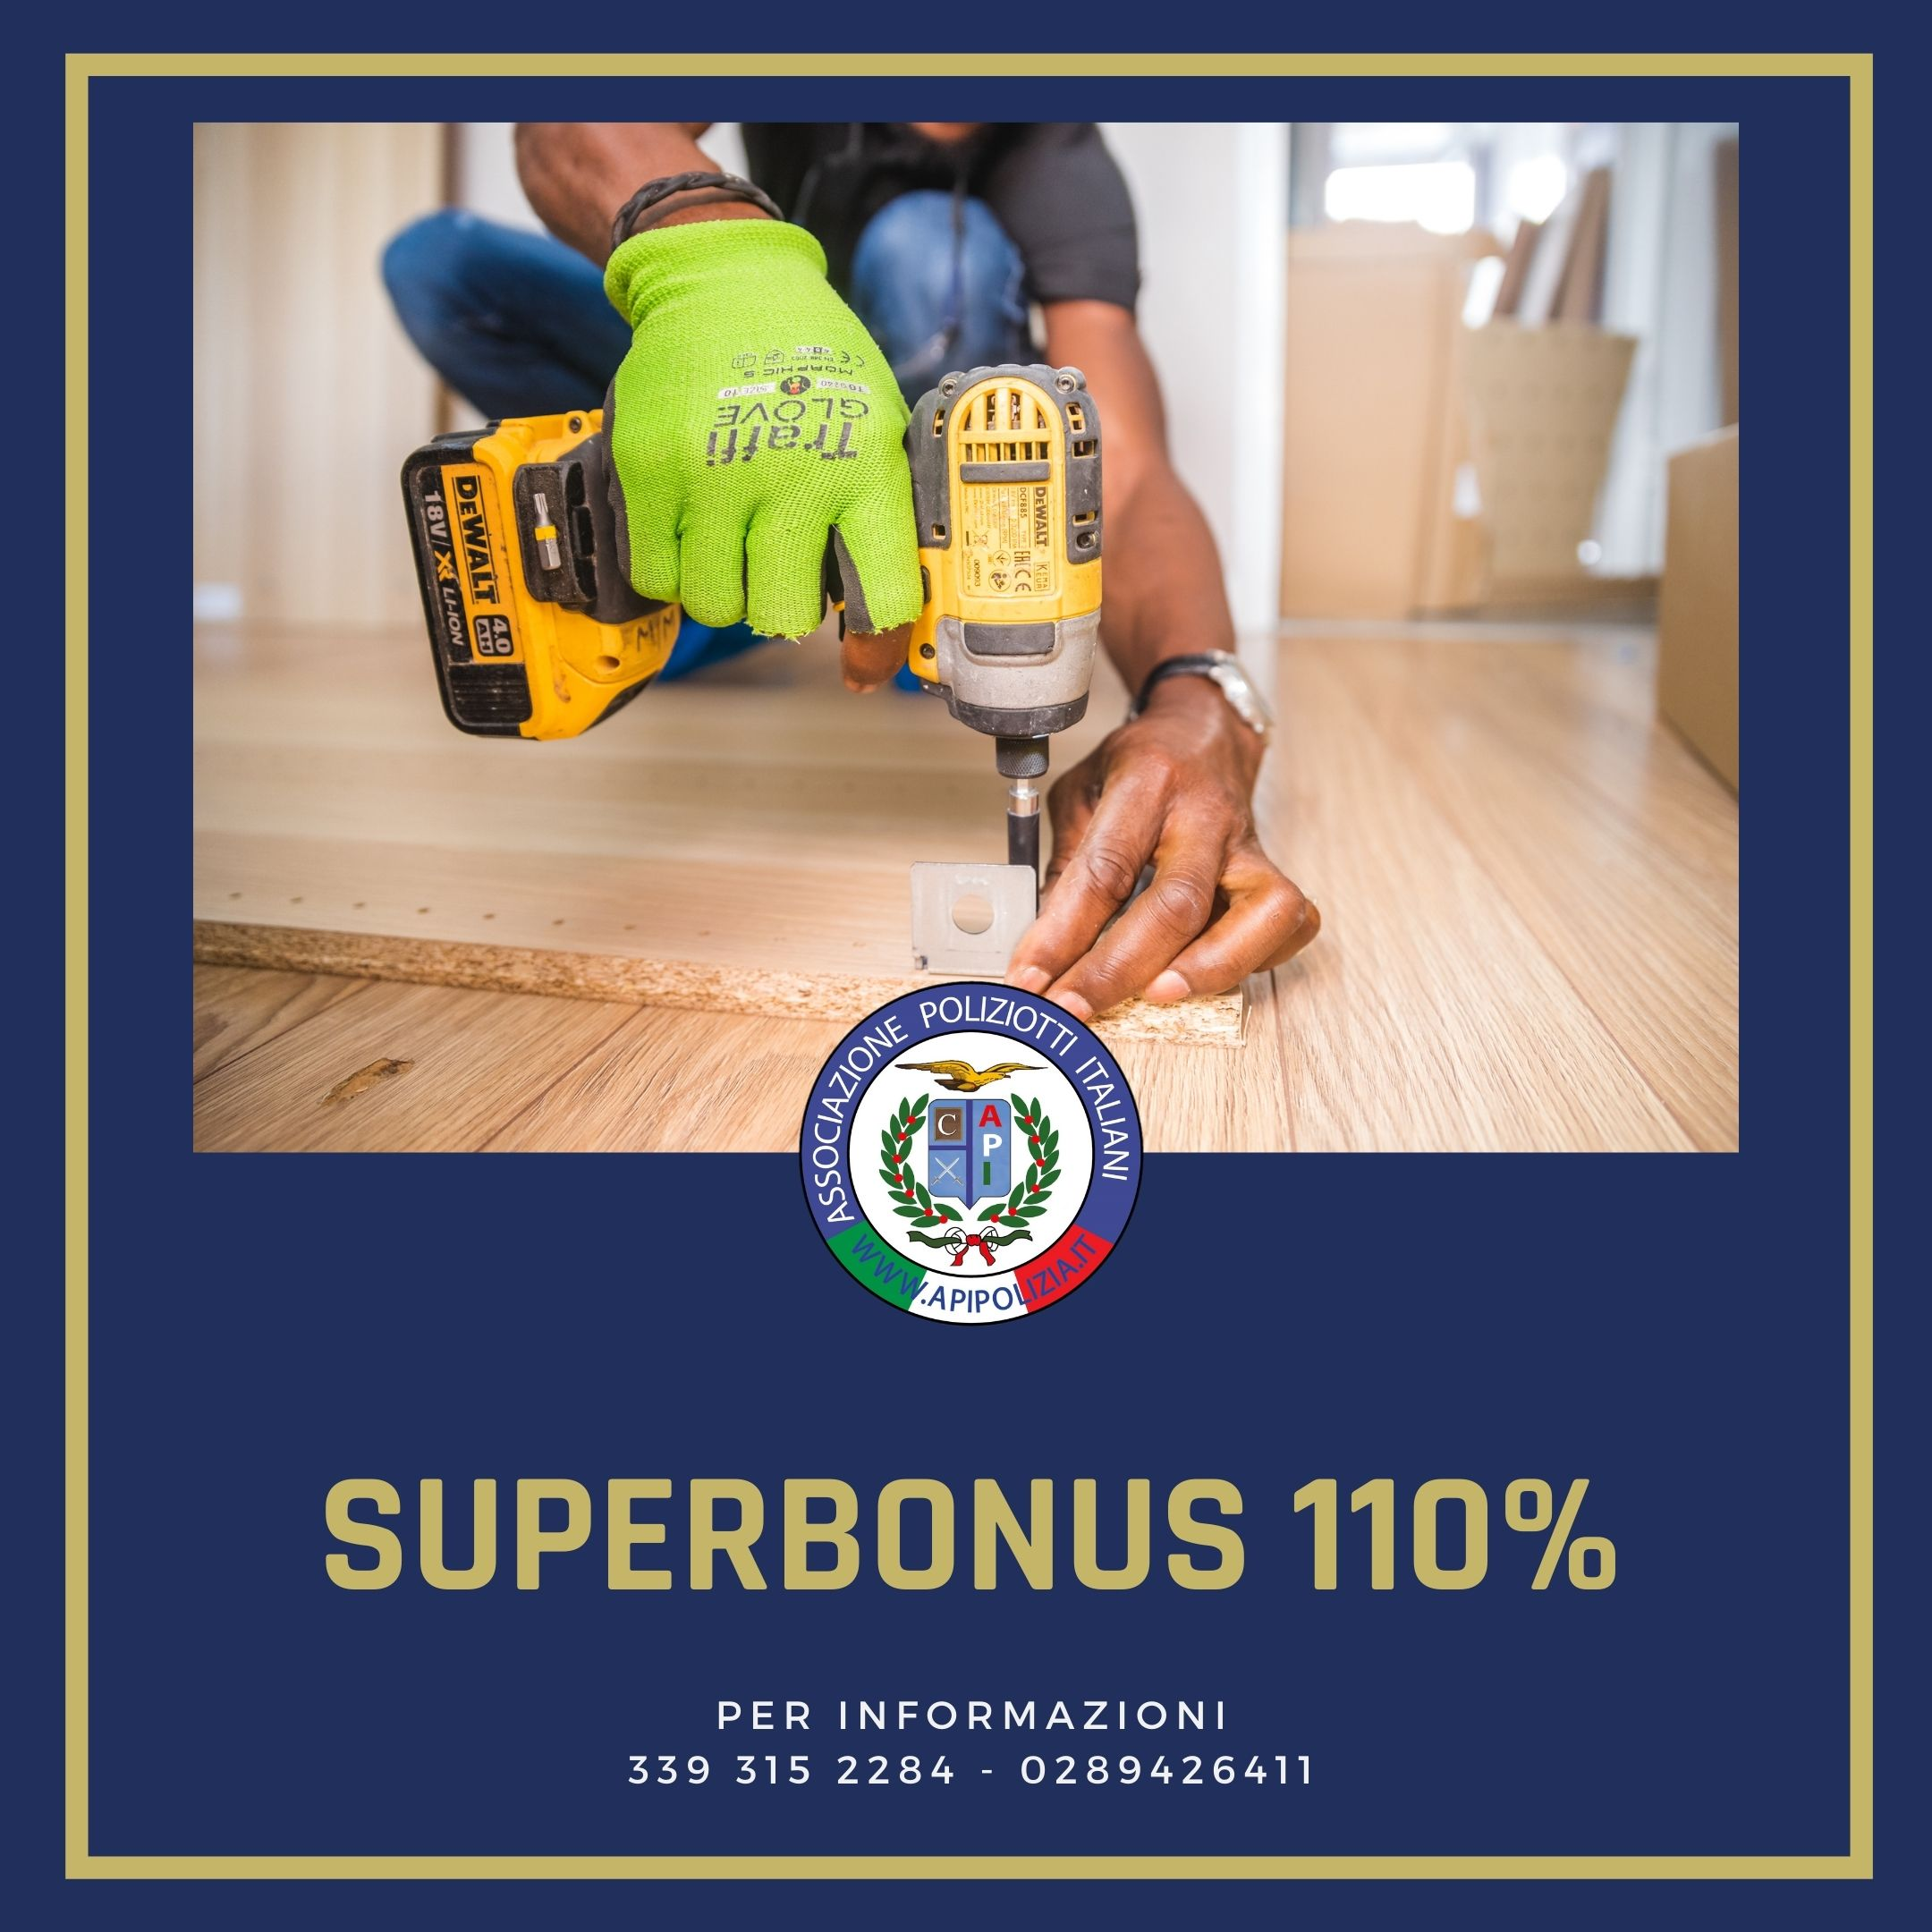 superbonus 110% caf api milano apipolizia